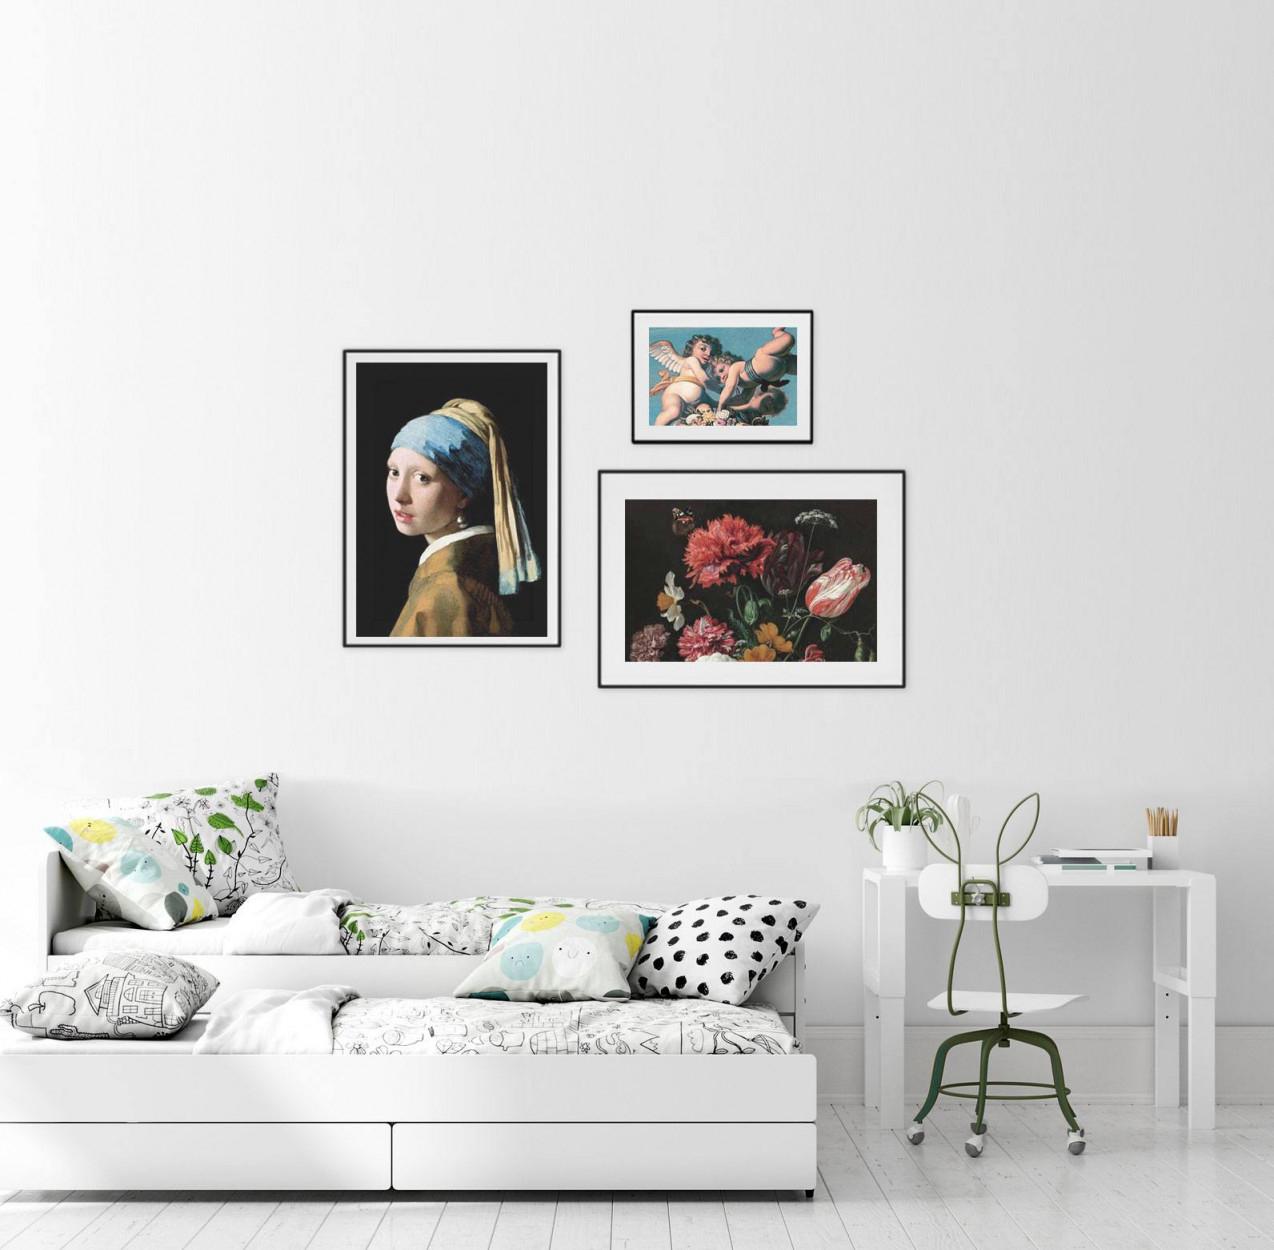 Fotowand Ideen  Fotowand Gestalten Inspiration  Ratgeber von Fotowand Ideen Wohnzimmer Bild